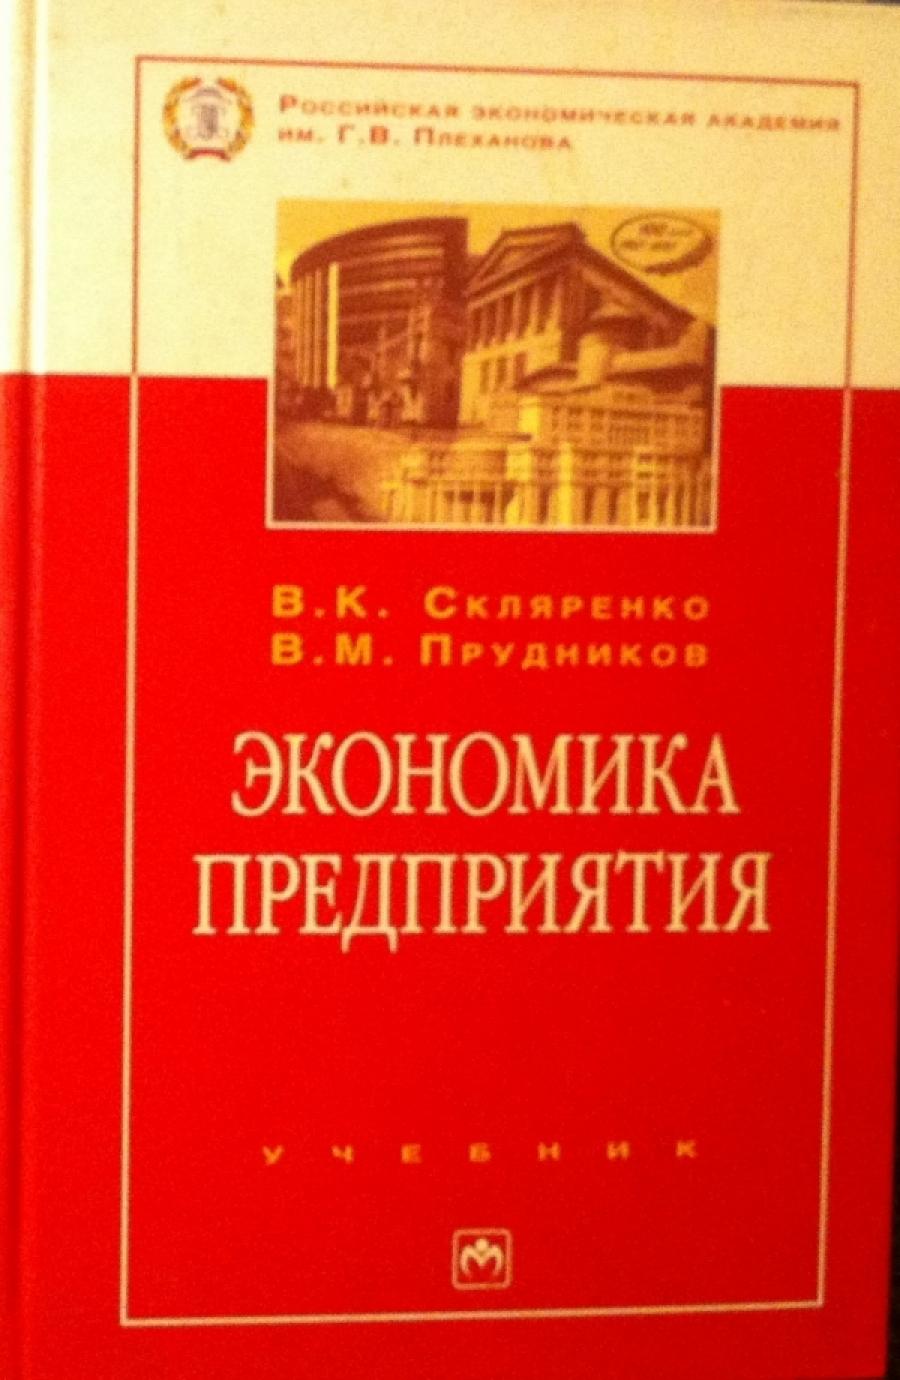 Обложка книги:  волков о.и., девяткин о.в. - экономика предприятия